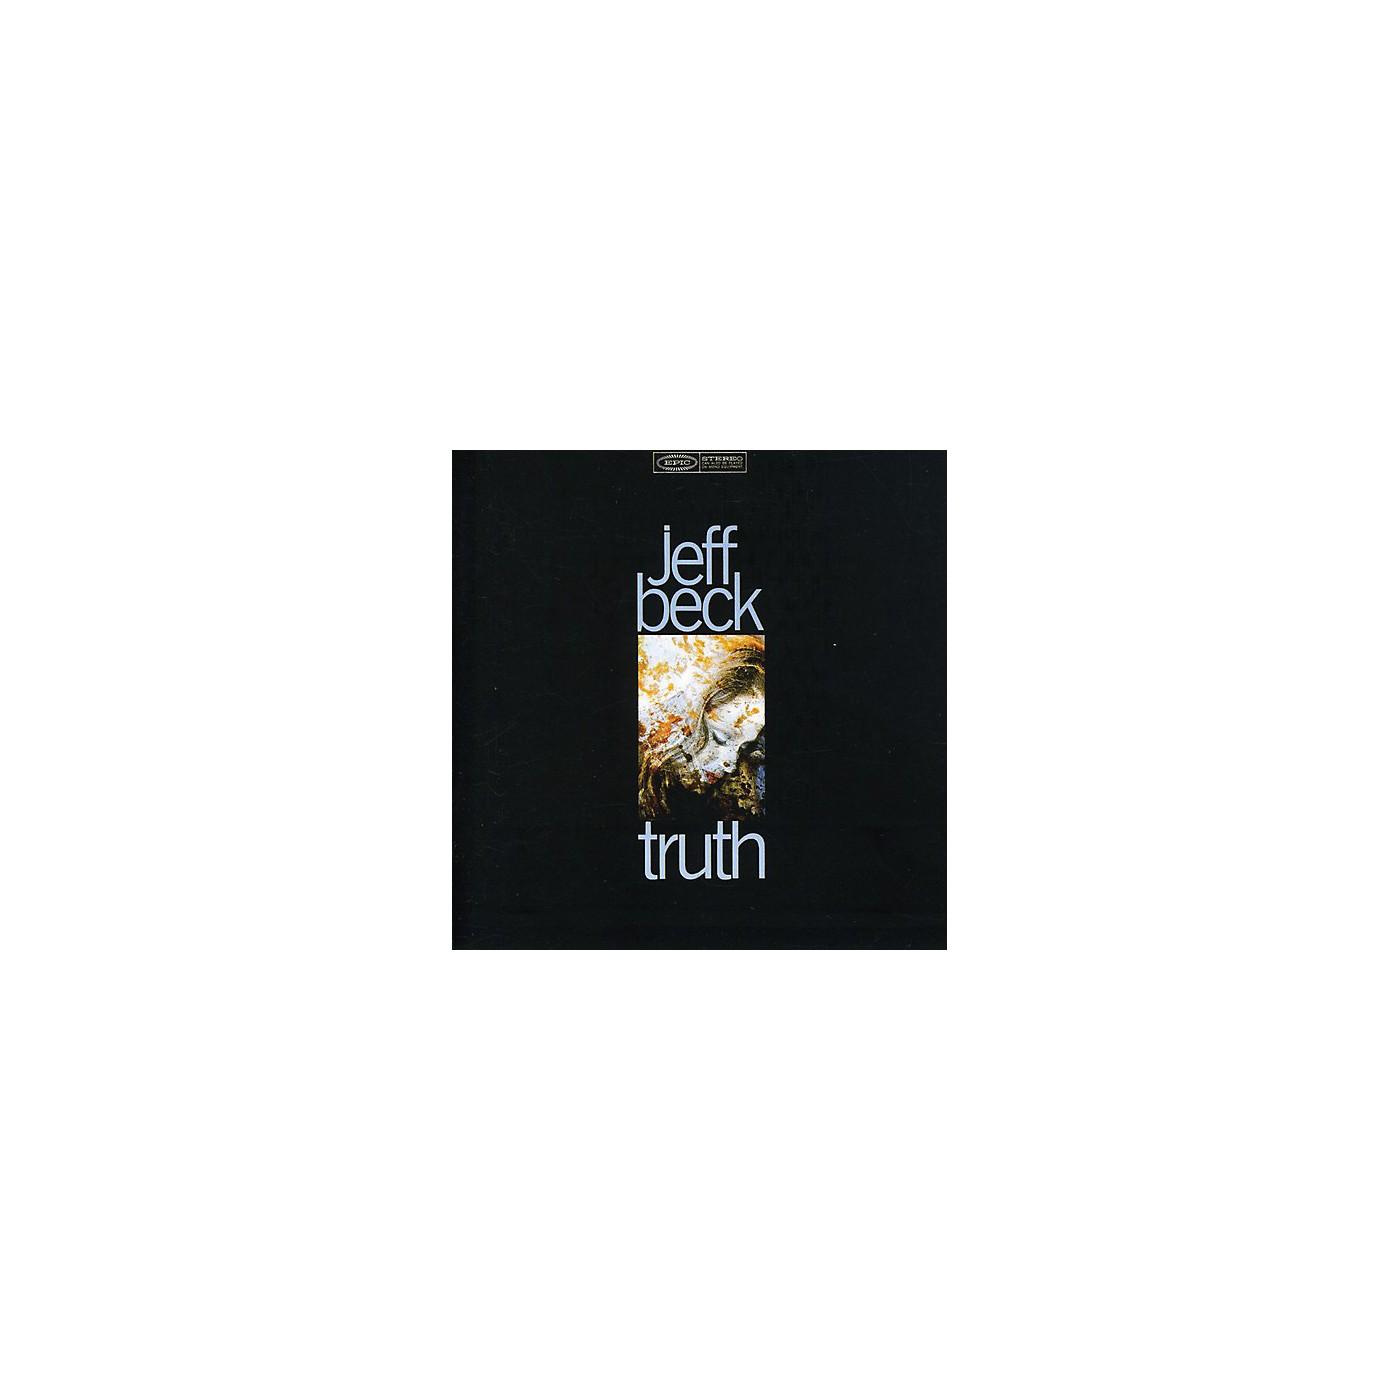 Alliance Jeff Beck - Truth (CD) thumbnail